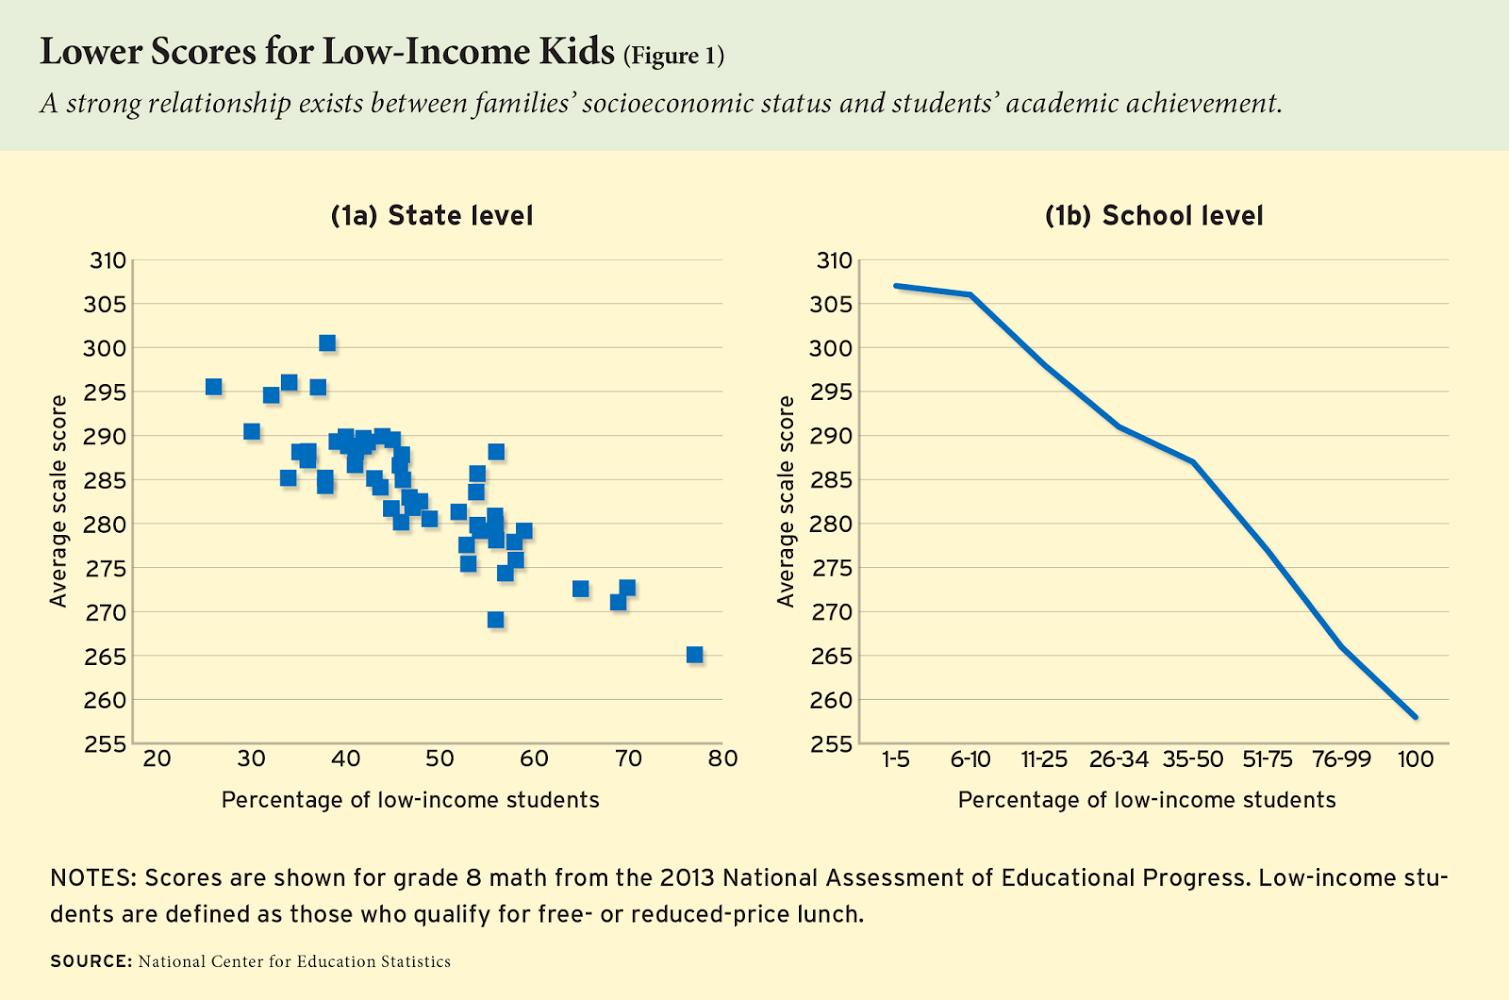 Source:  http://educationnext.org/americas-mediocre-test-scores-education-poverty-crisis/